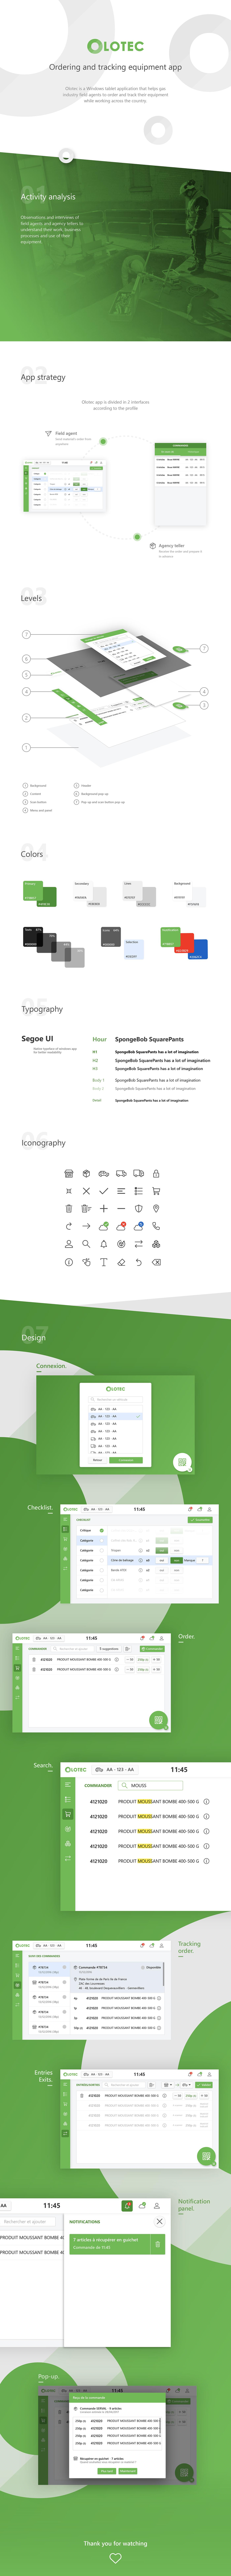 app application mobile Interface UX design business ui design olotec